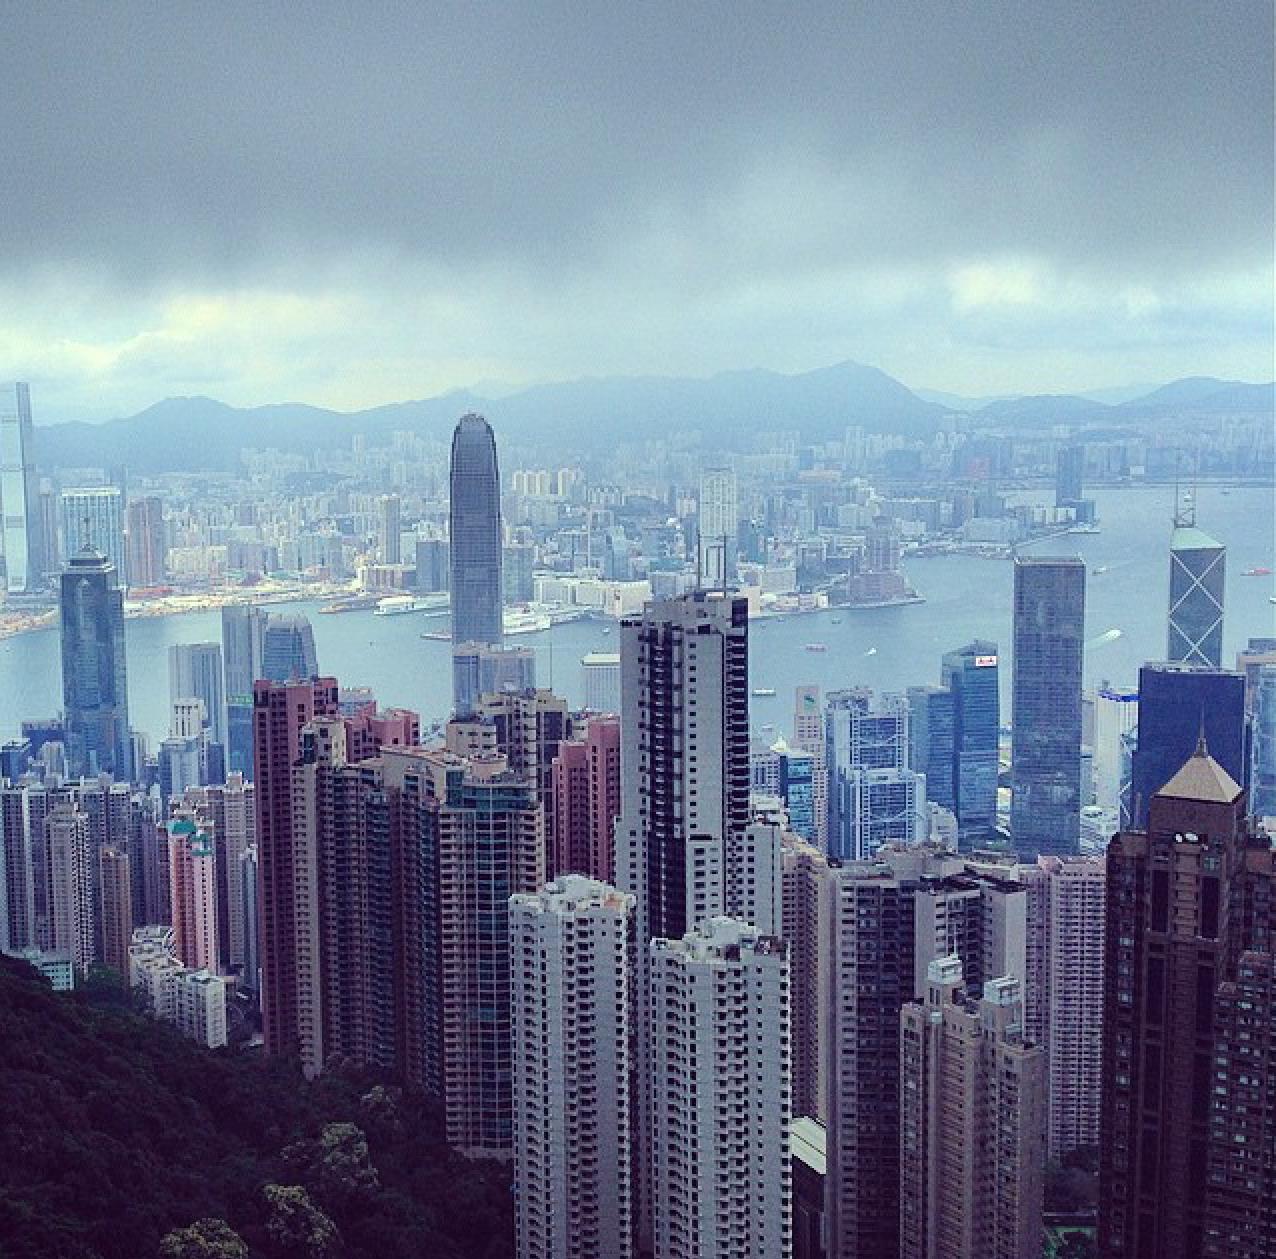 viktoria-peak-hong-kong-panorama